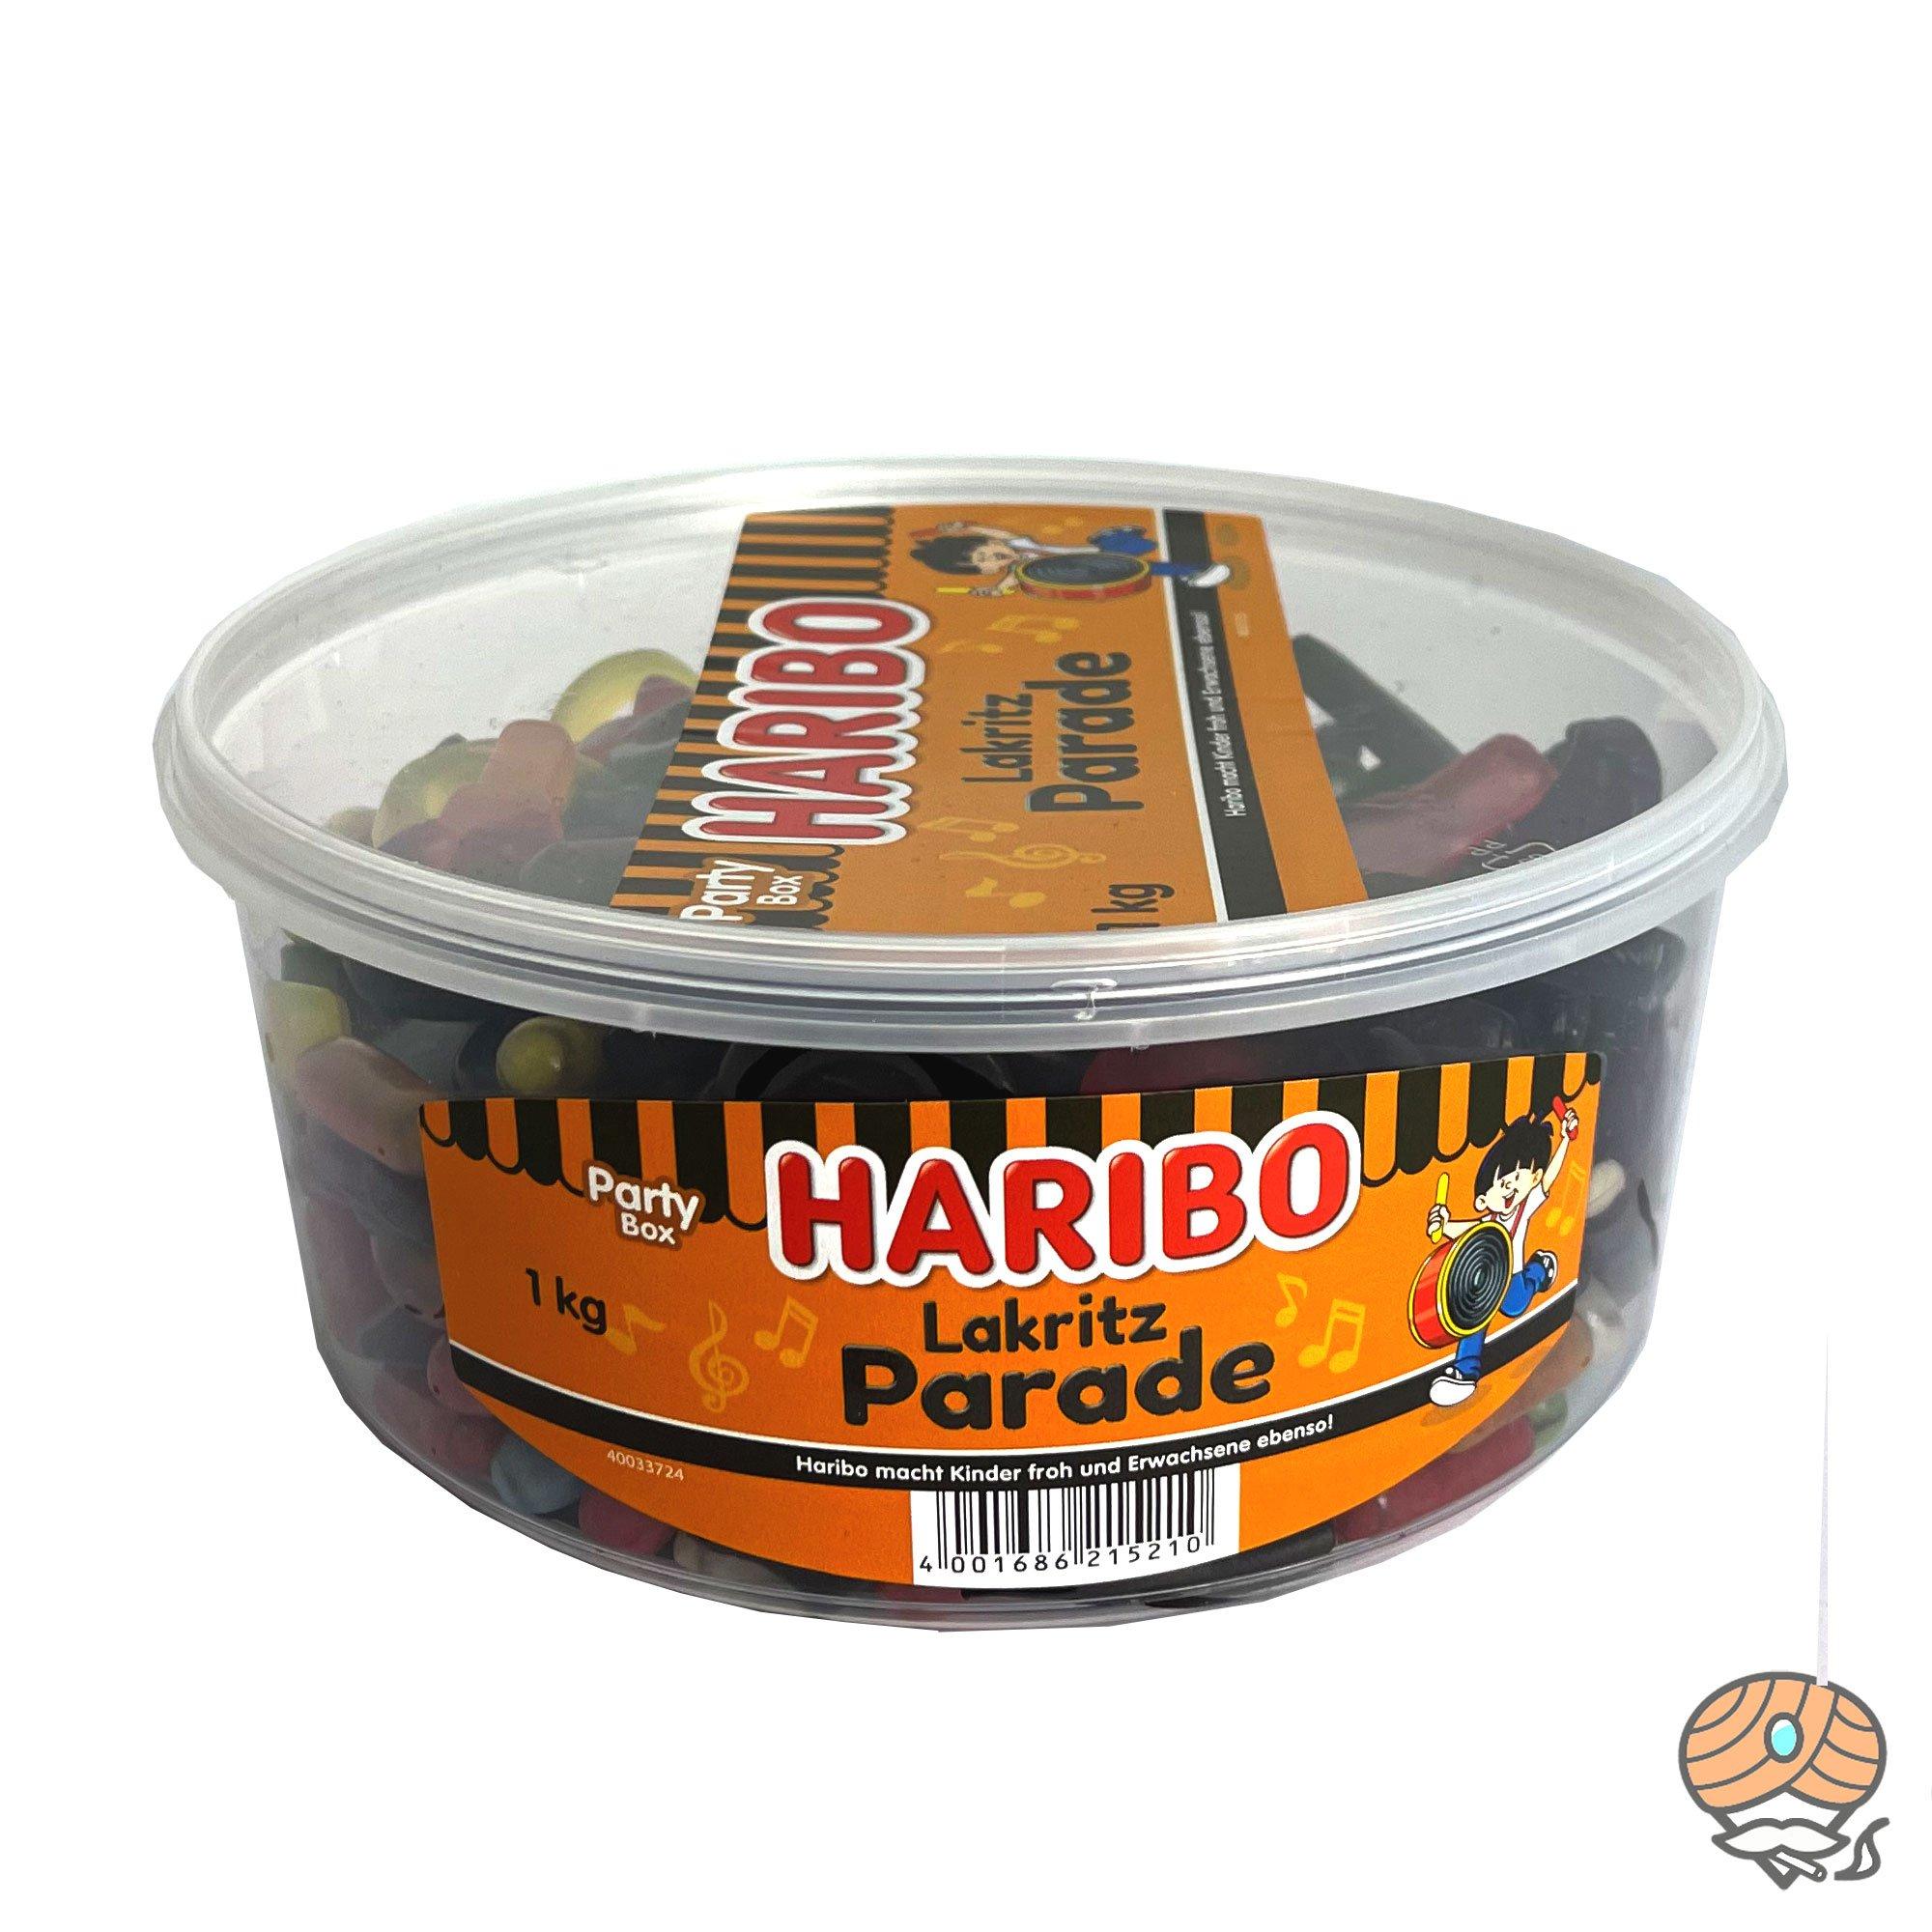 Haribo Lakritz Parade Party Box 1kg